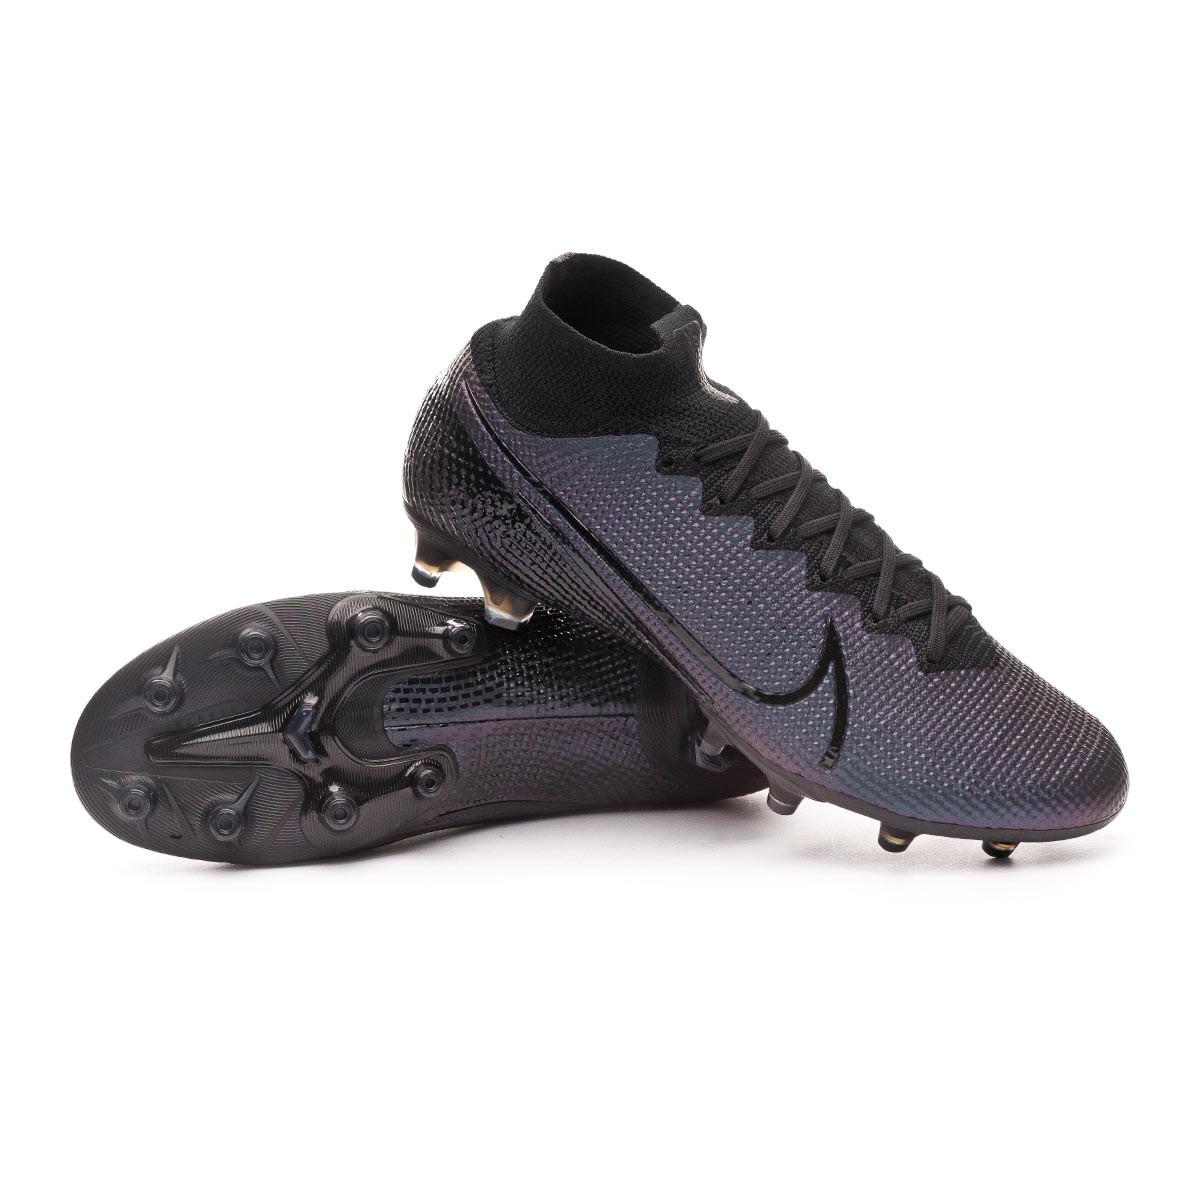 Chuteiras Nike Mercurial Superfly 7 Elite AG PRO